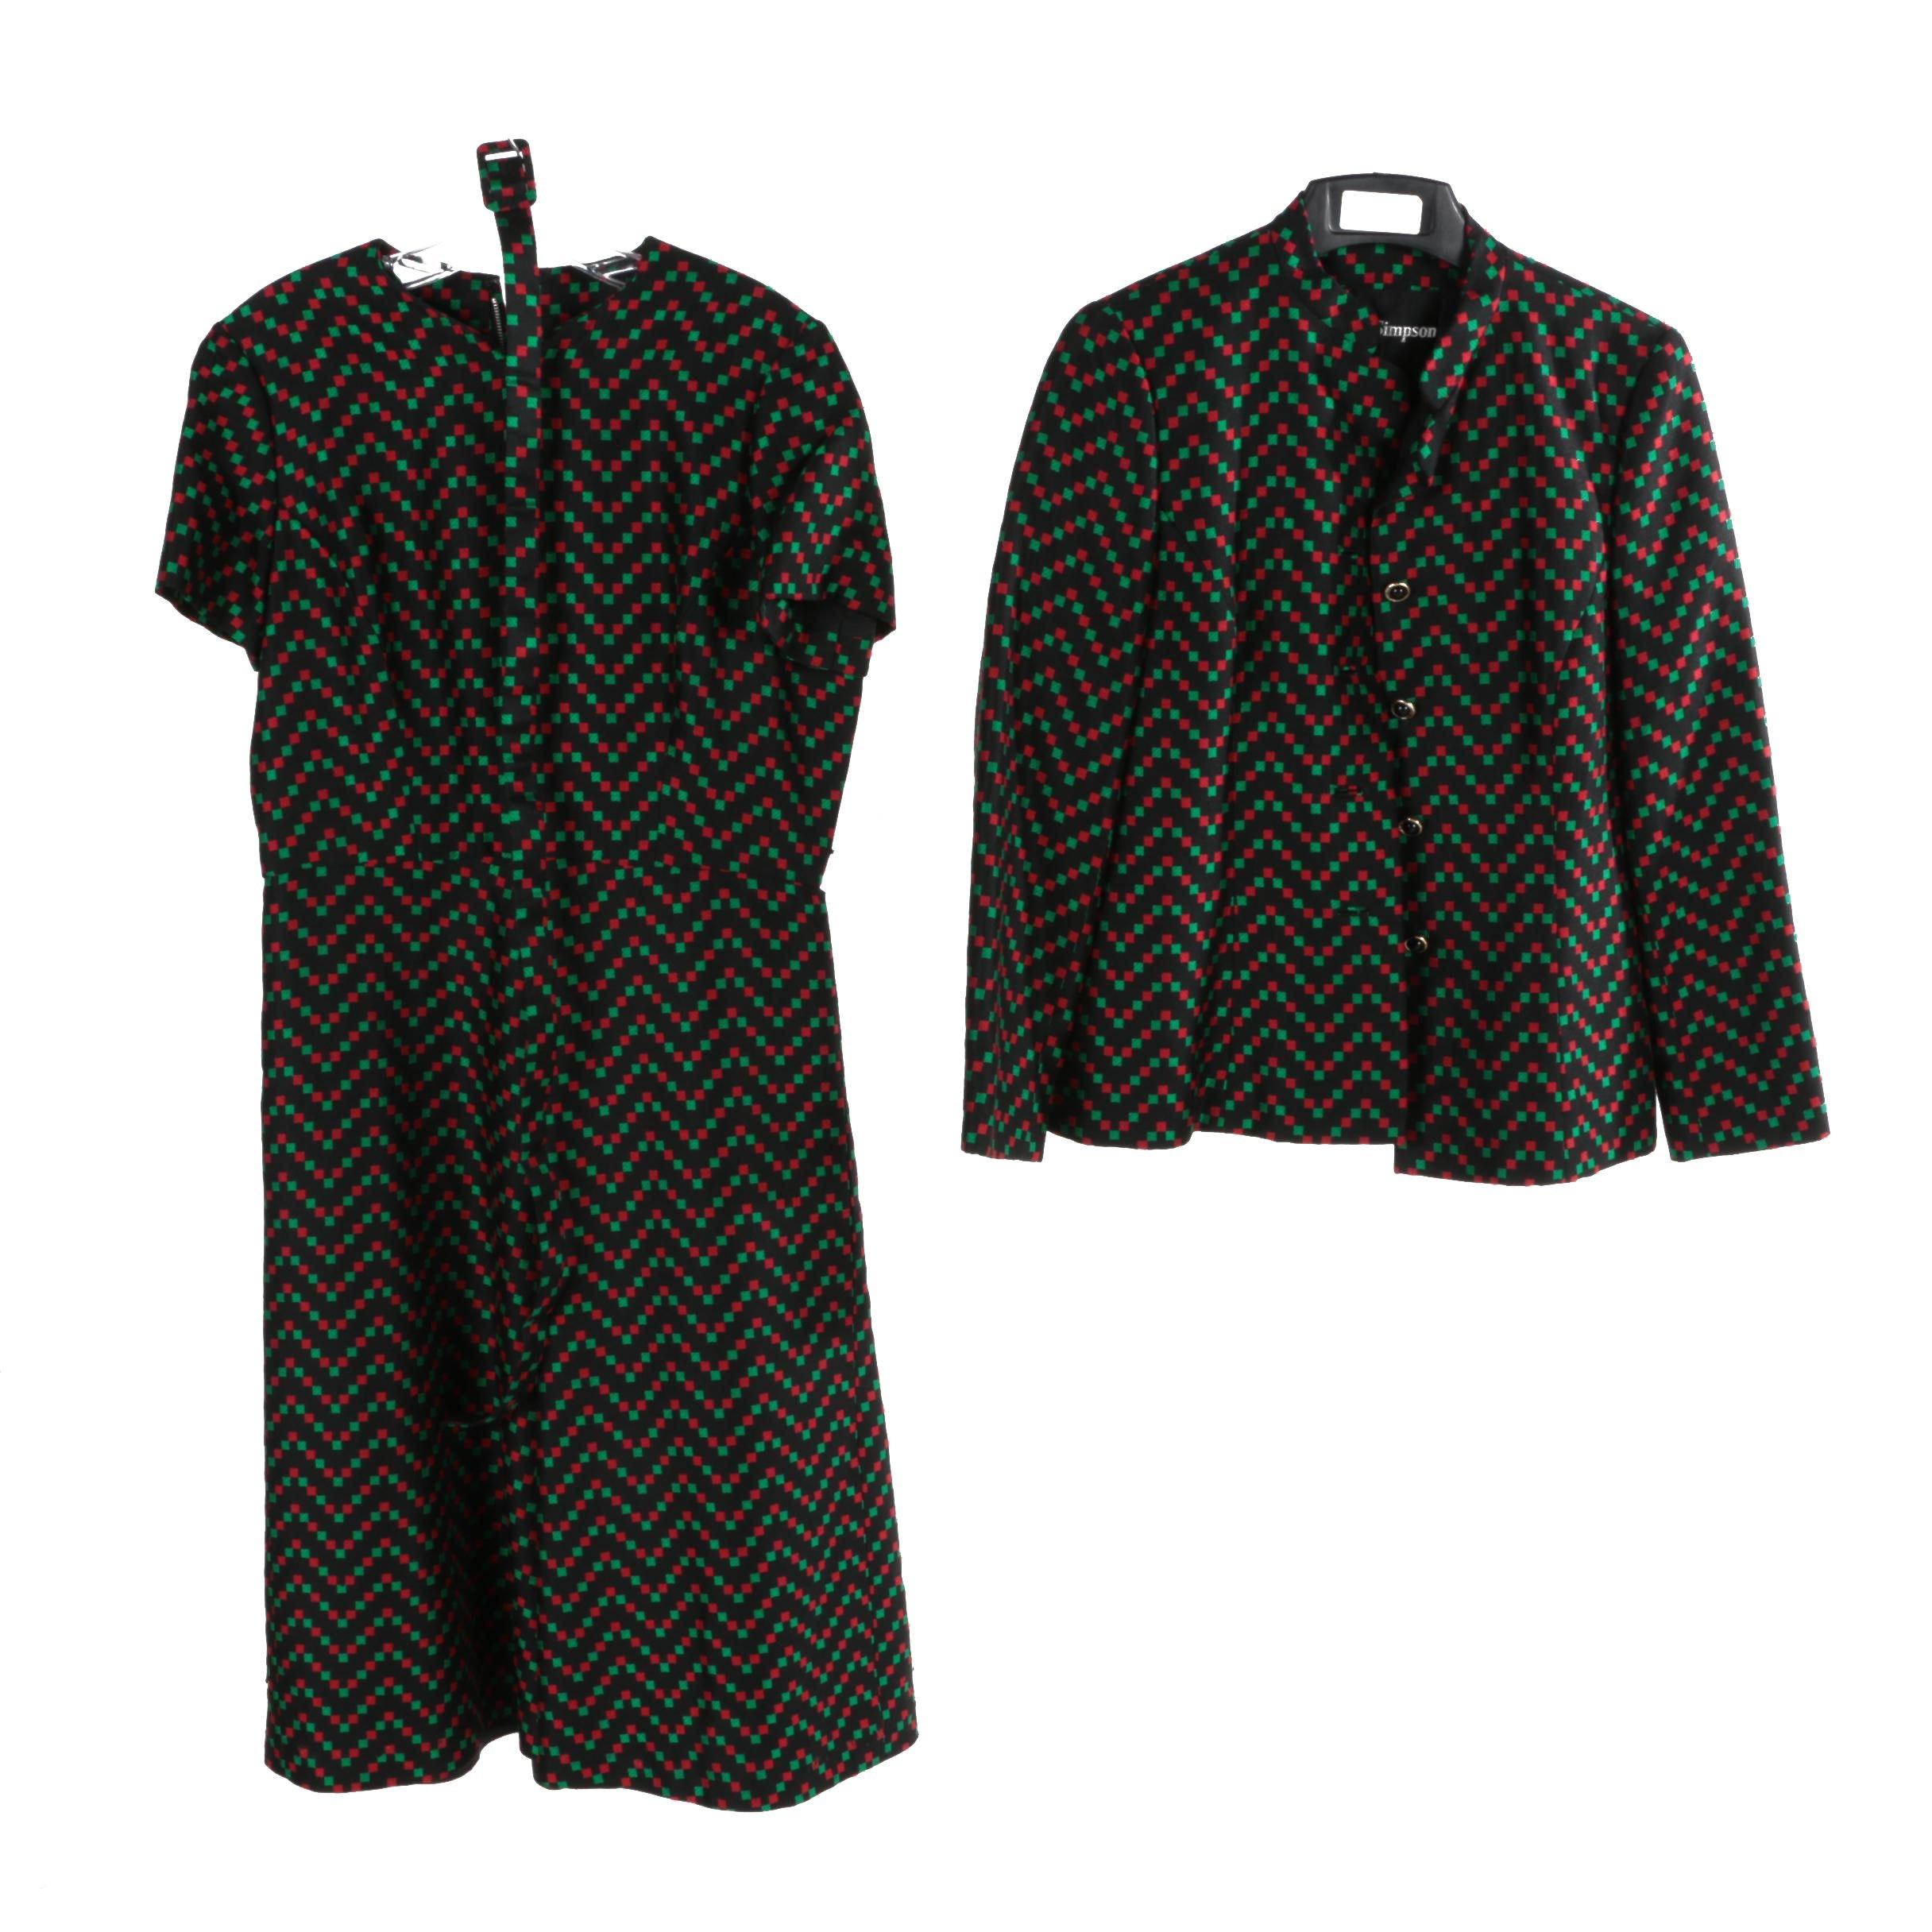 Vintage Adele Simpson Printed Dress Suit